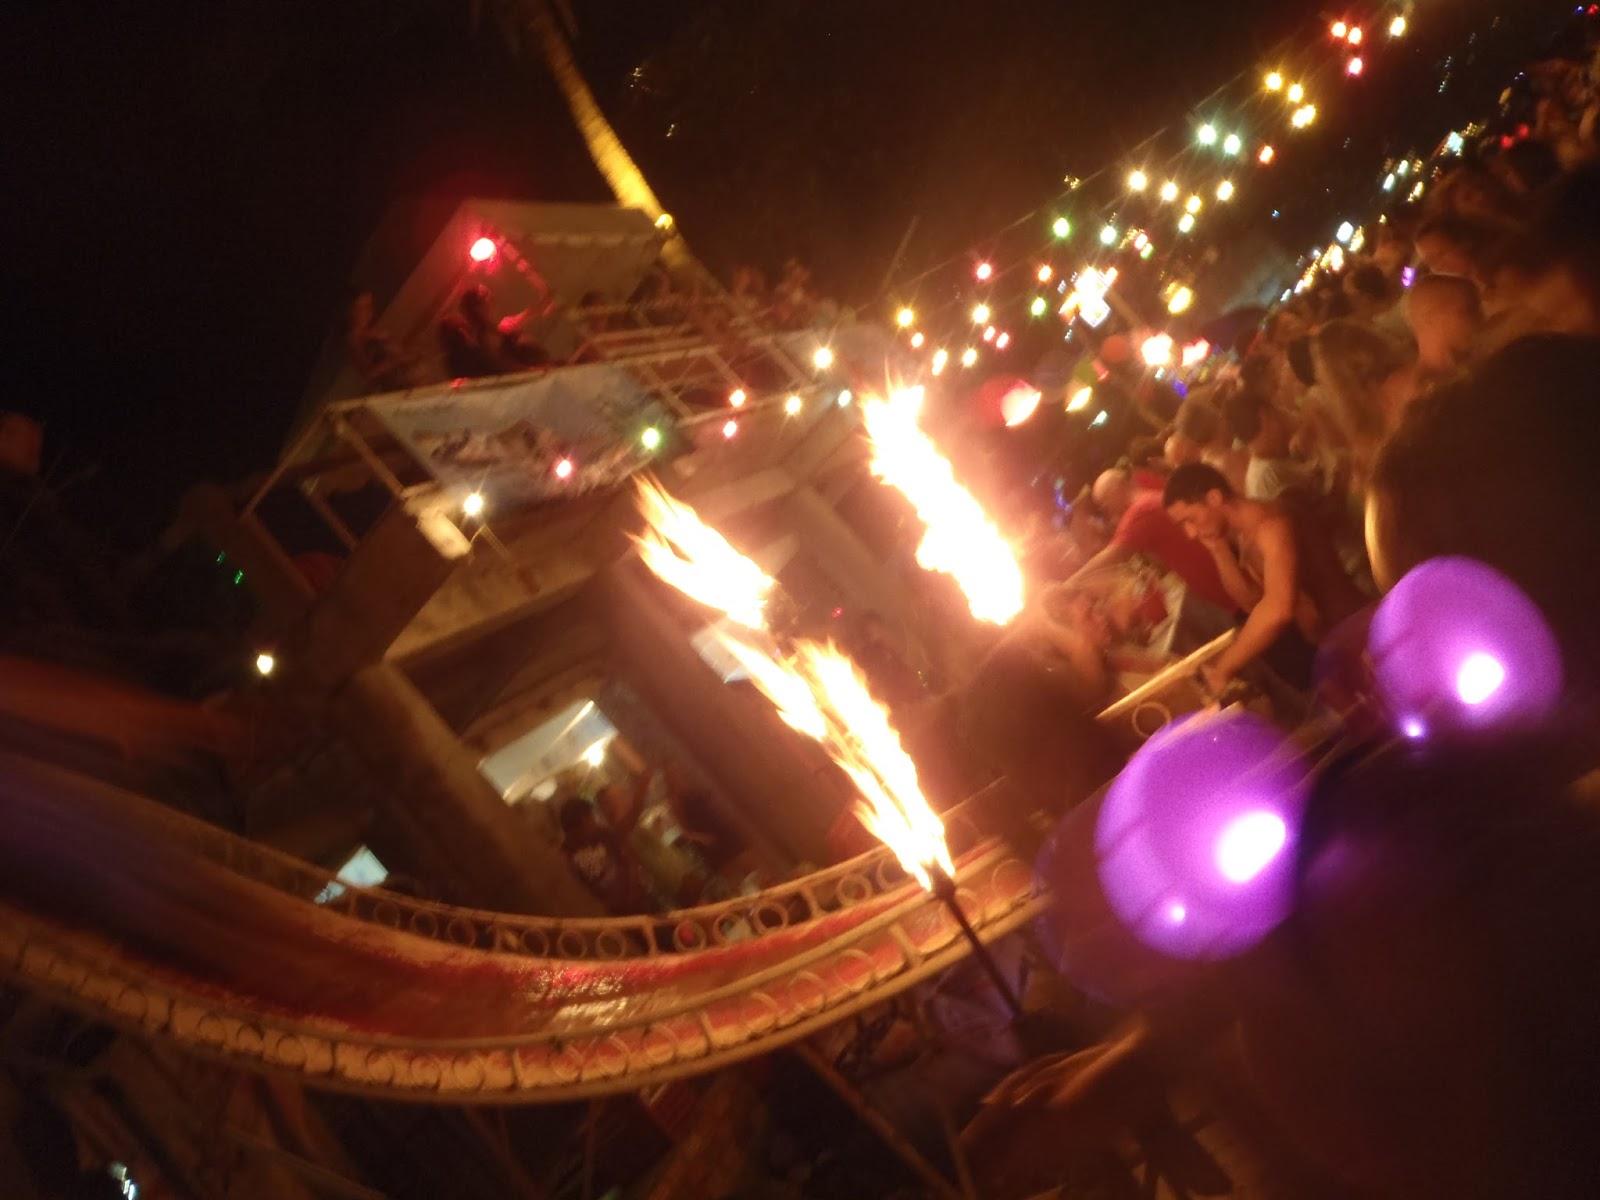 Ko Pha Ngan Thailand Full Moon Party Fire Slide